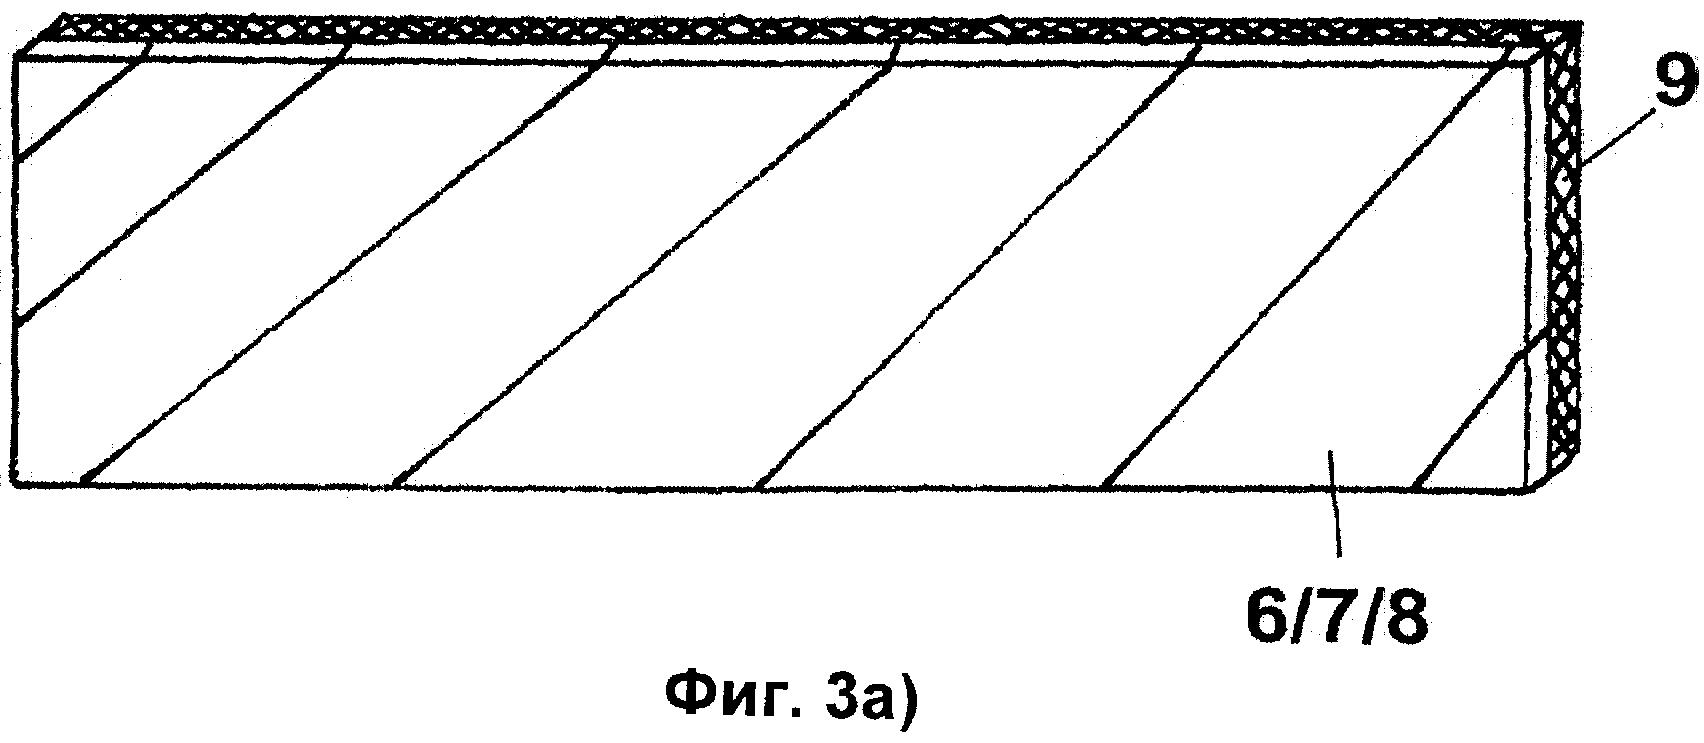 Элемент опалубки